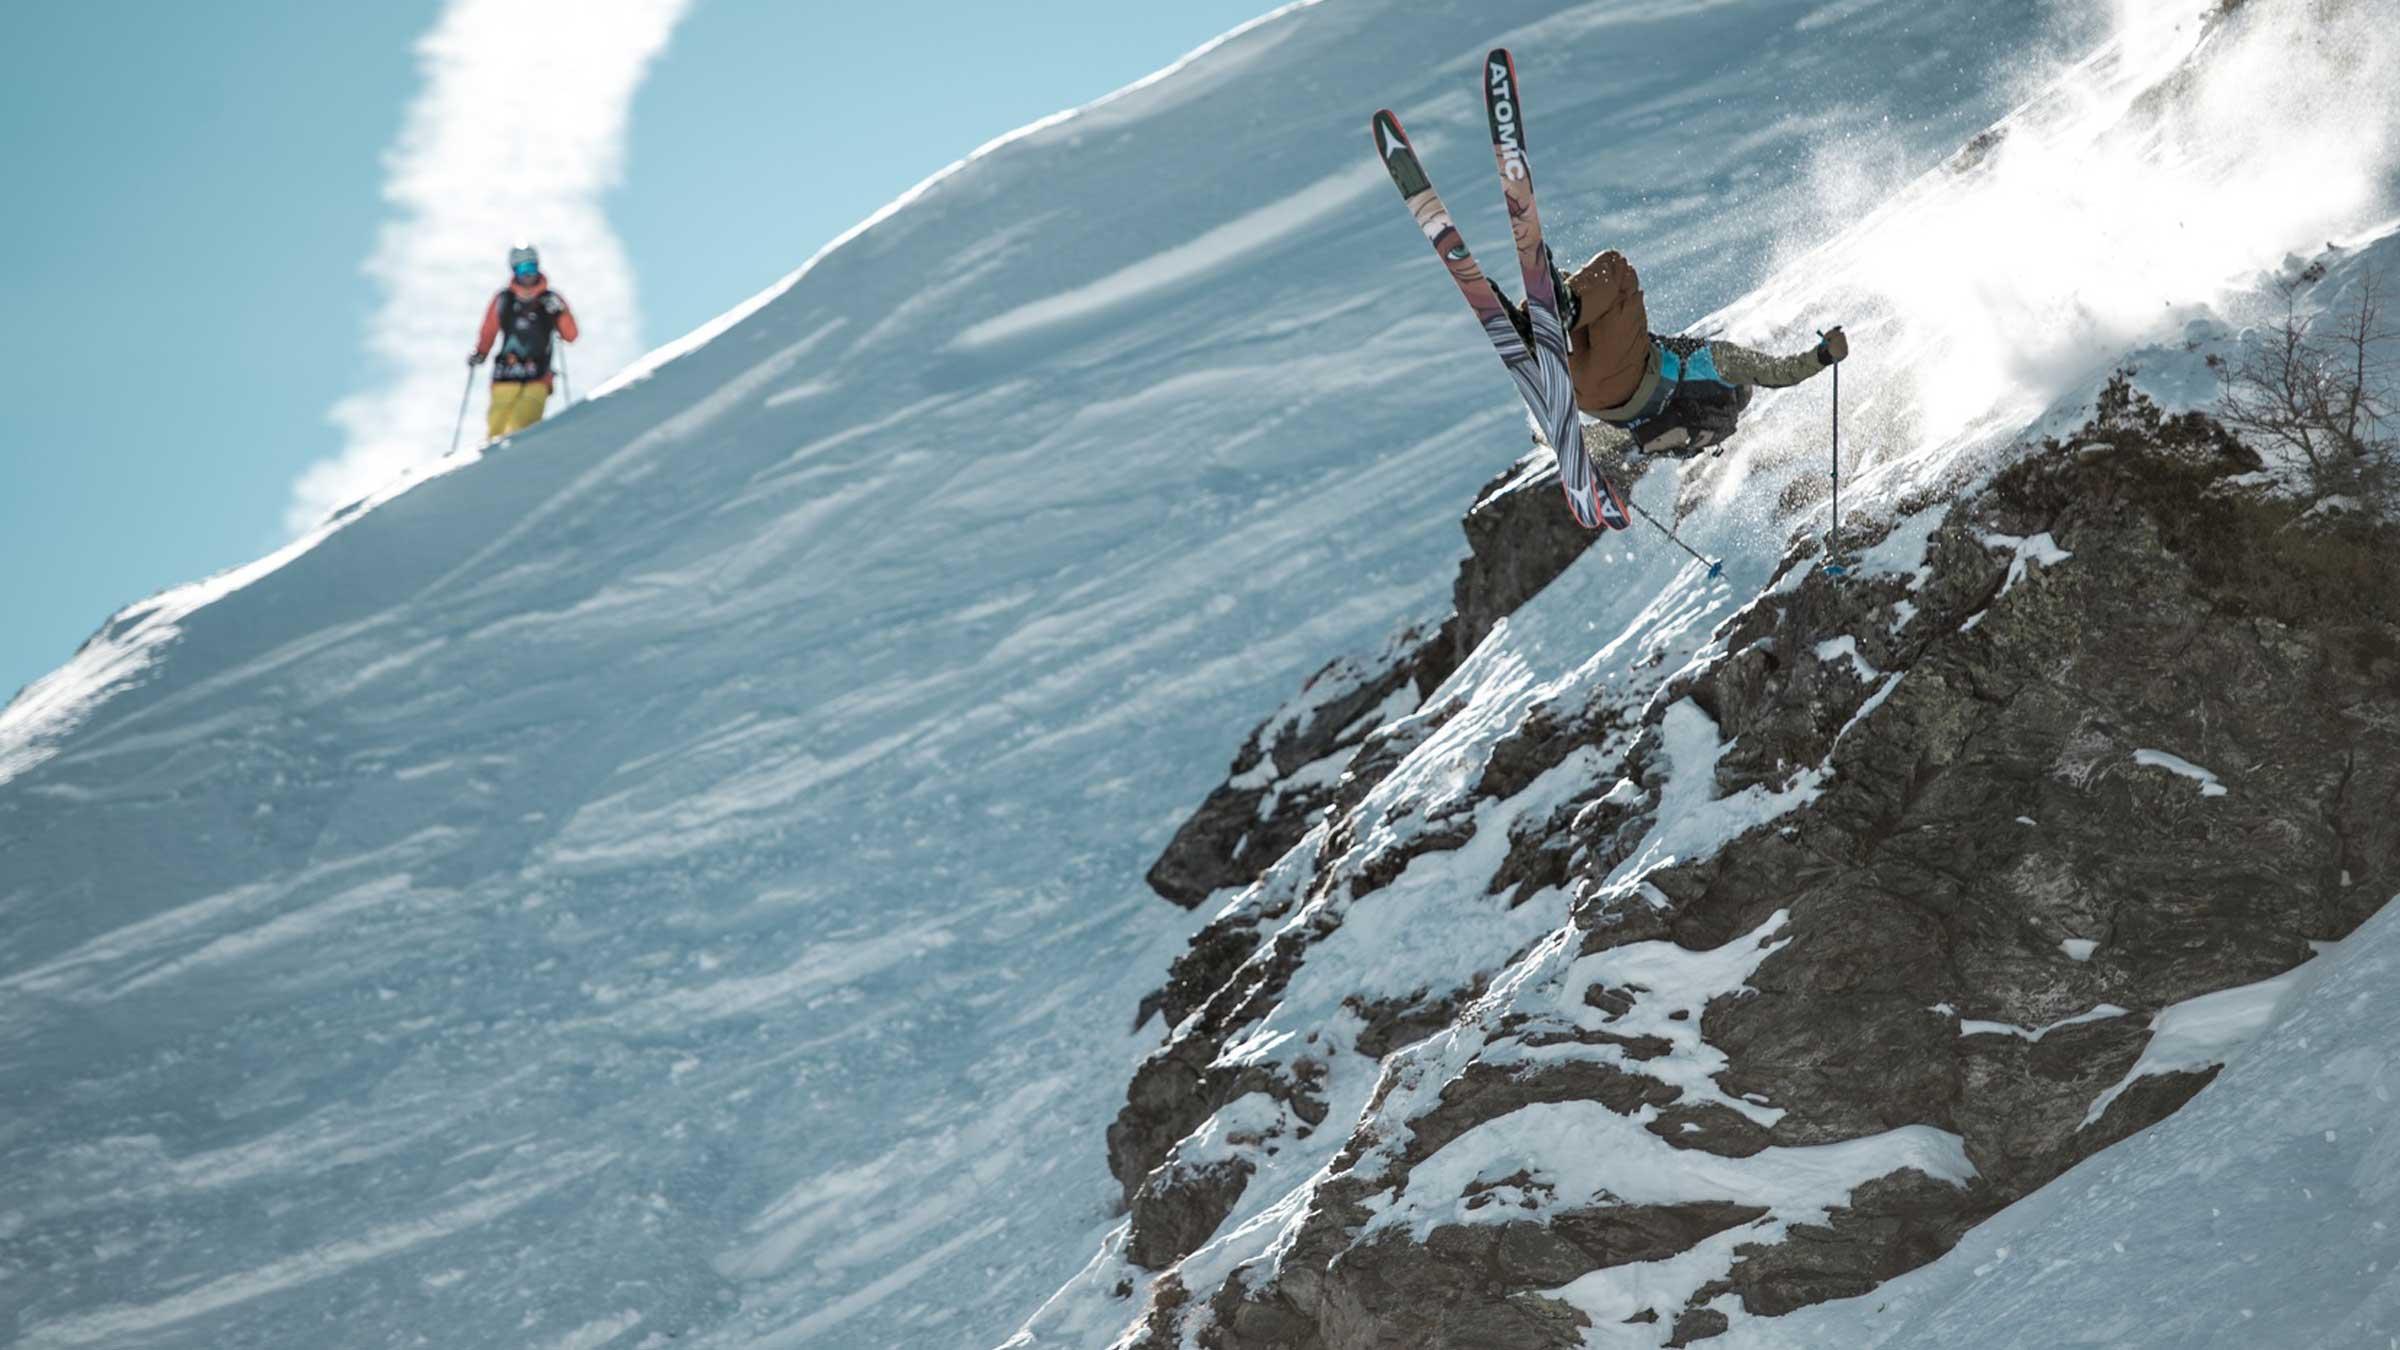 Skifahrer Backflip Cliff - OPEN FACES Obergurgl-Hochgurgl